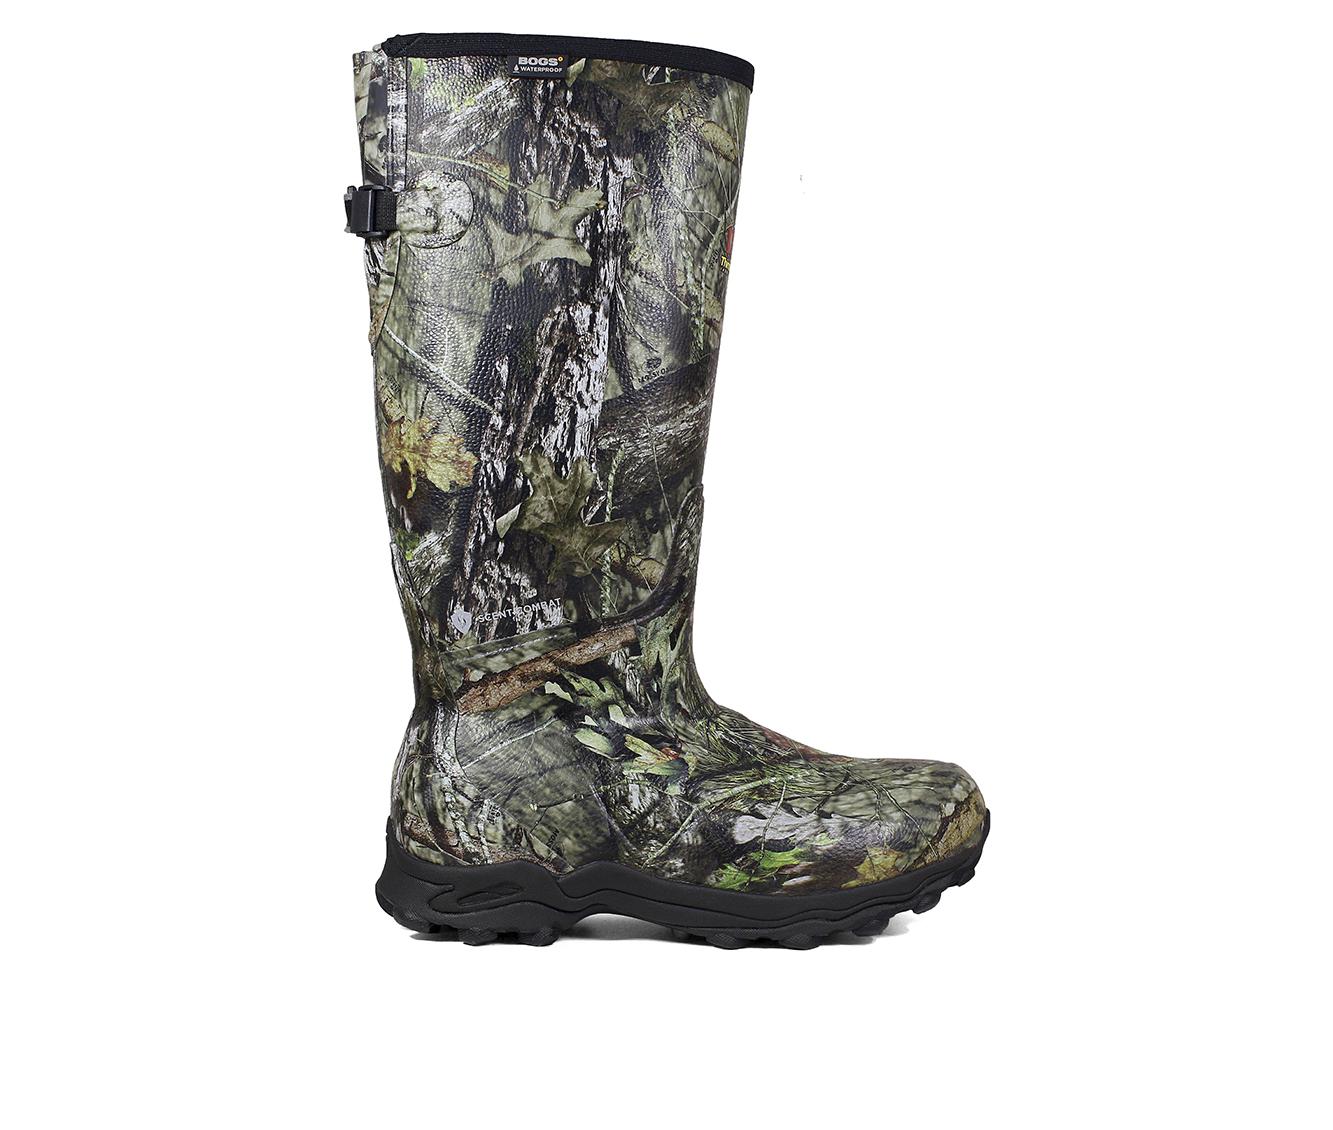 Bogs Footwear Blaze II Men's Boots (Multi-color Fabric)